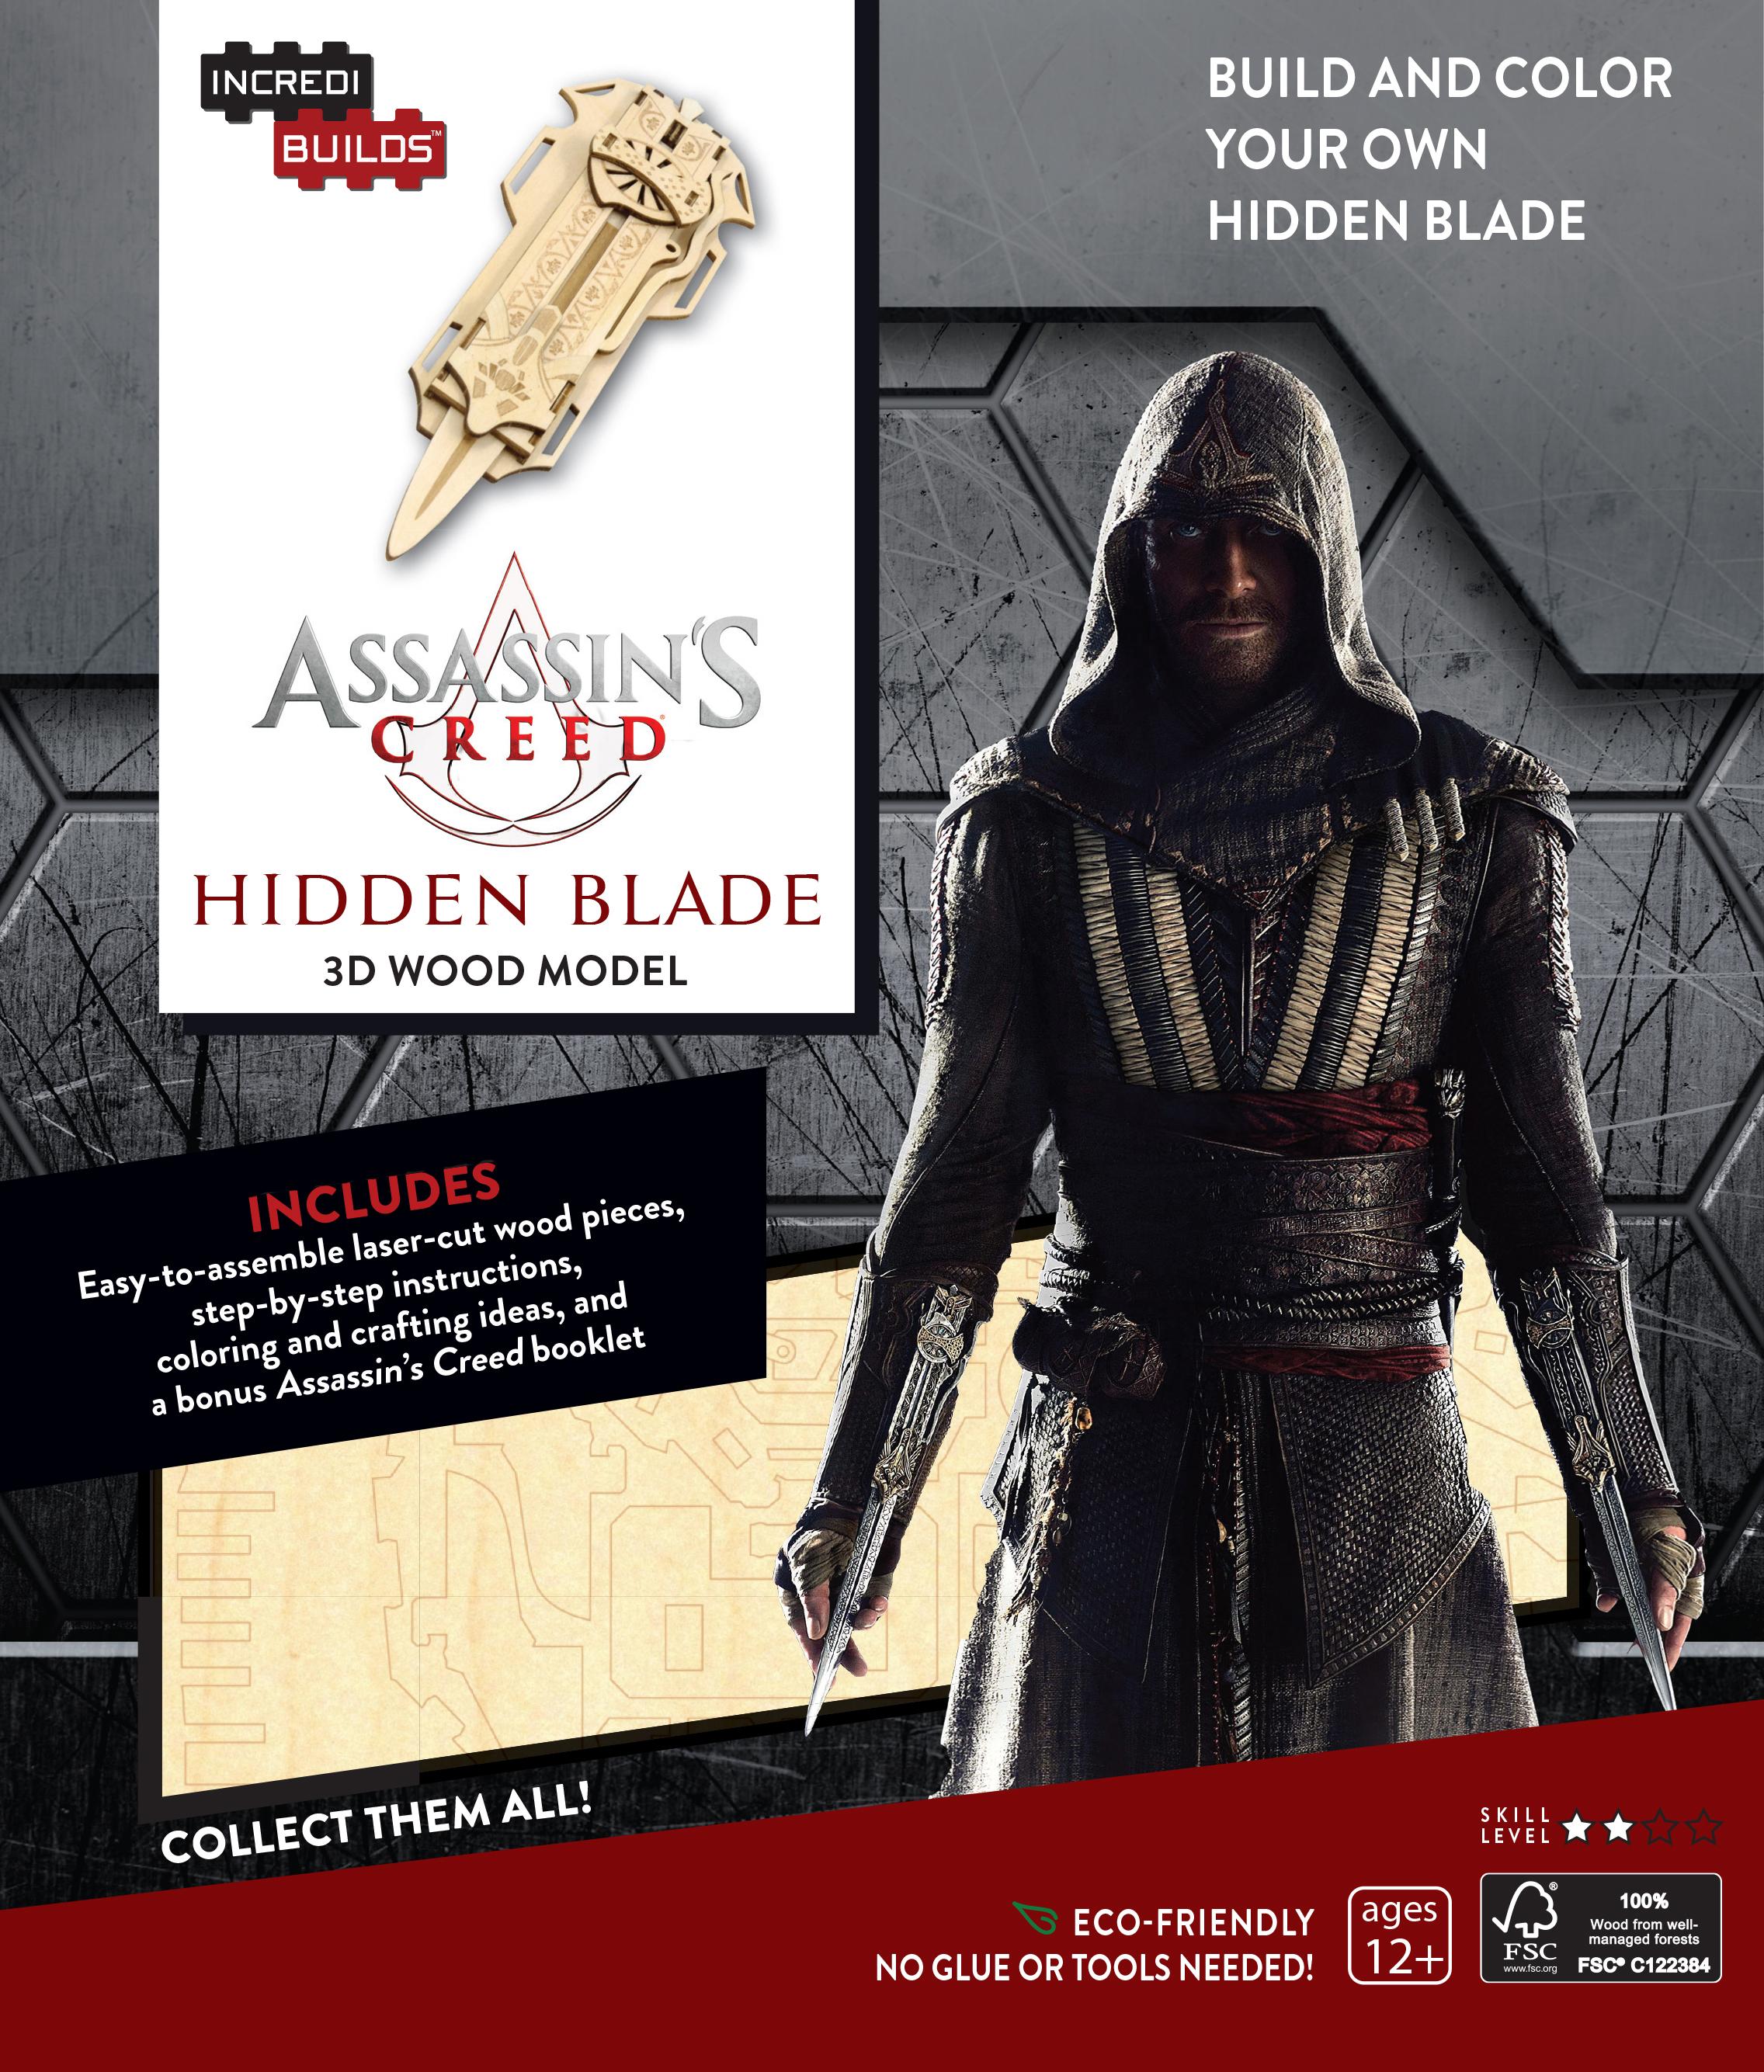 IB_AssassinCreed_Kit_pkg_081716.indd